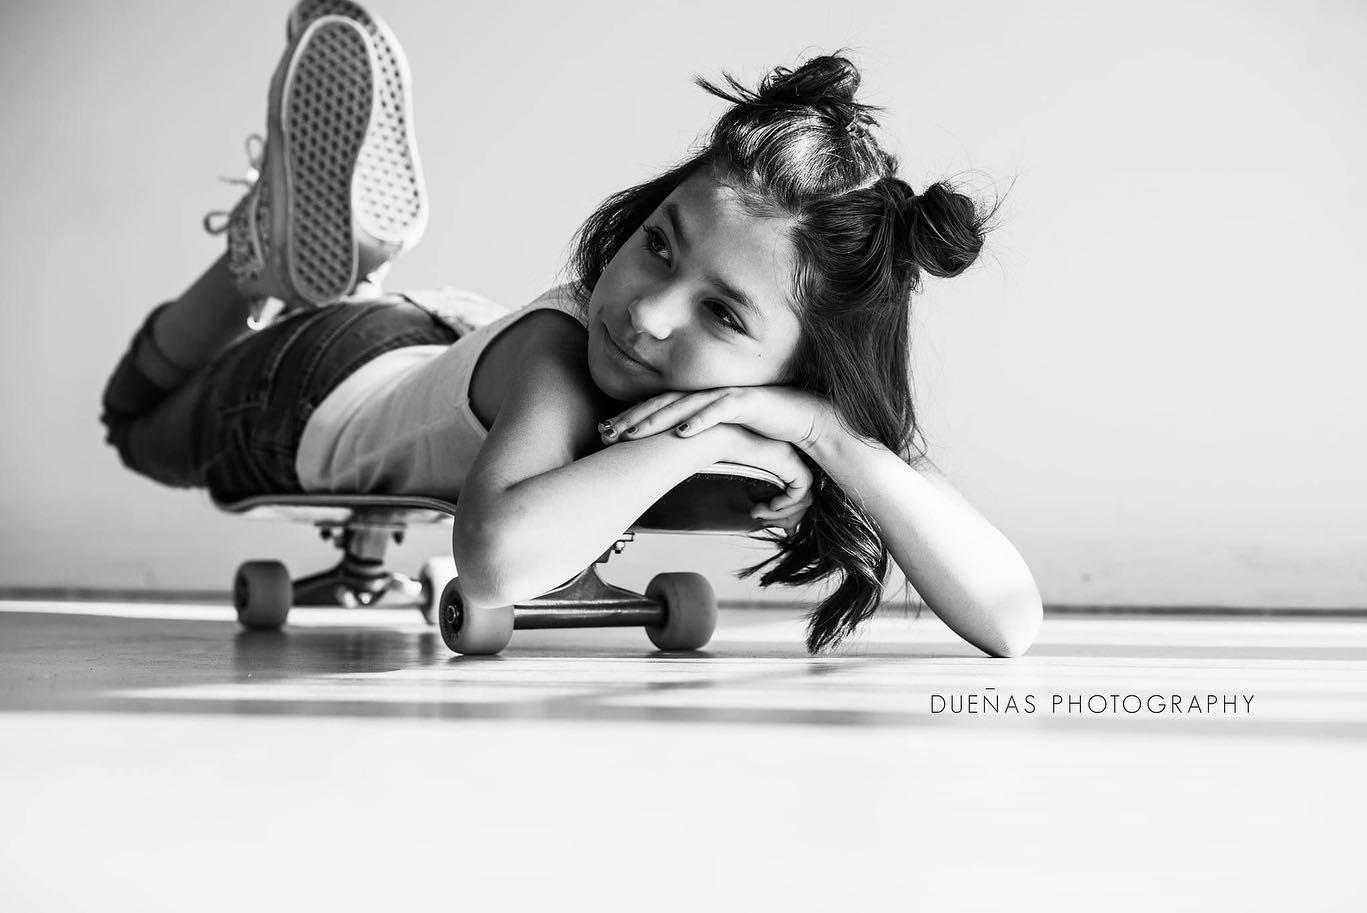 Duenas Photography